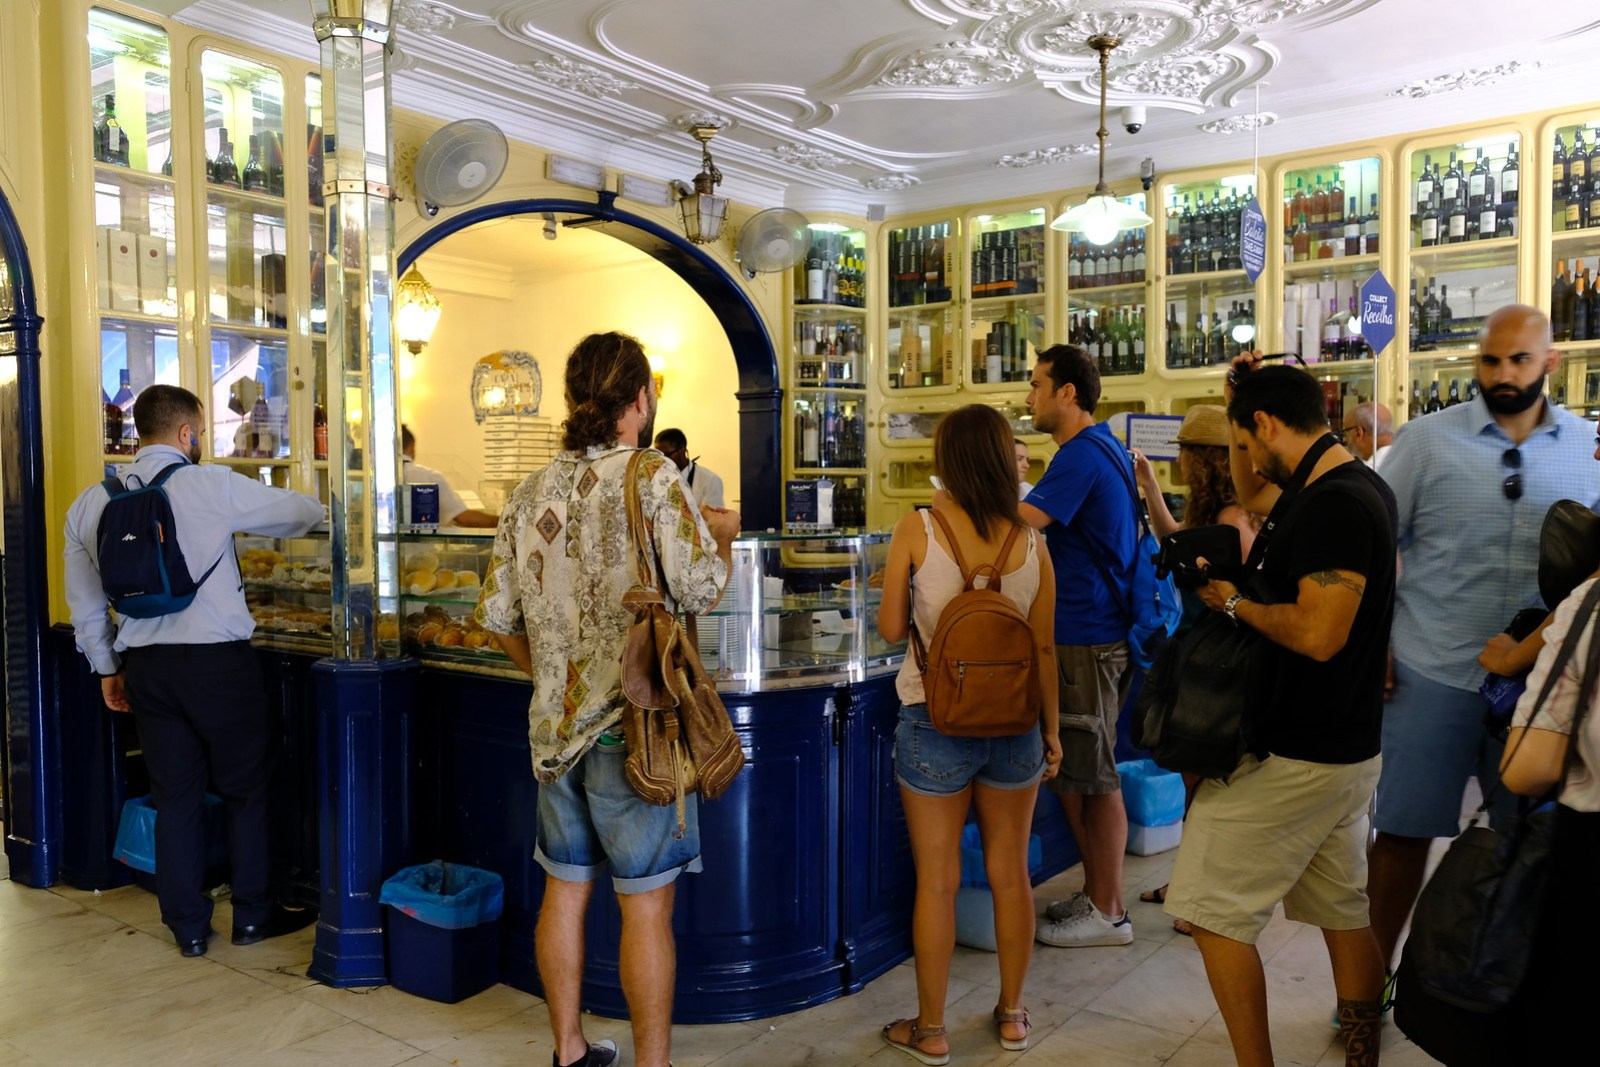 Inside the Lobby of Pasteis de Belem